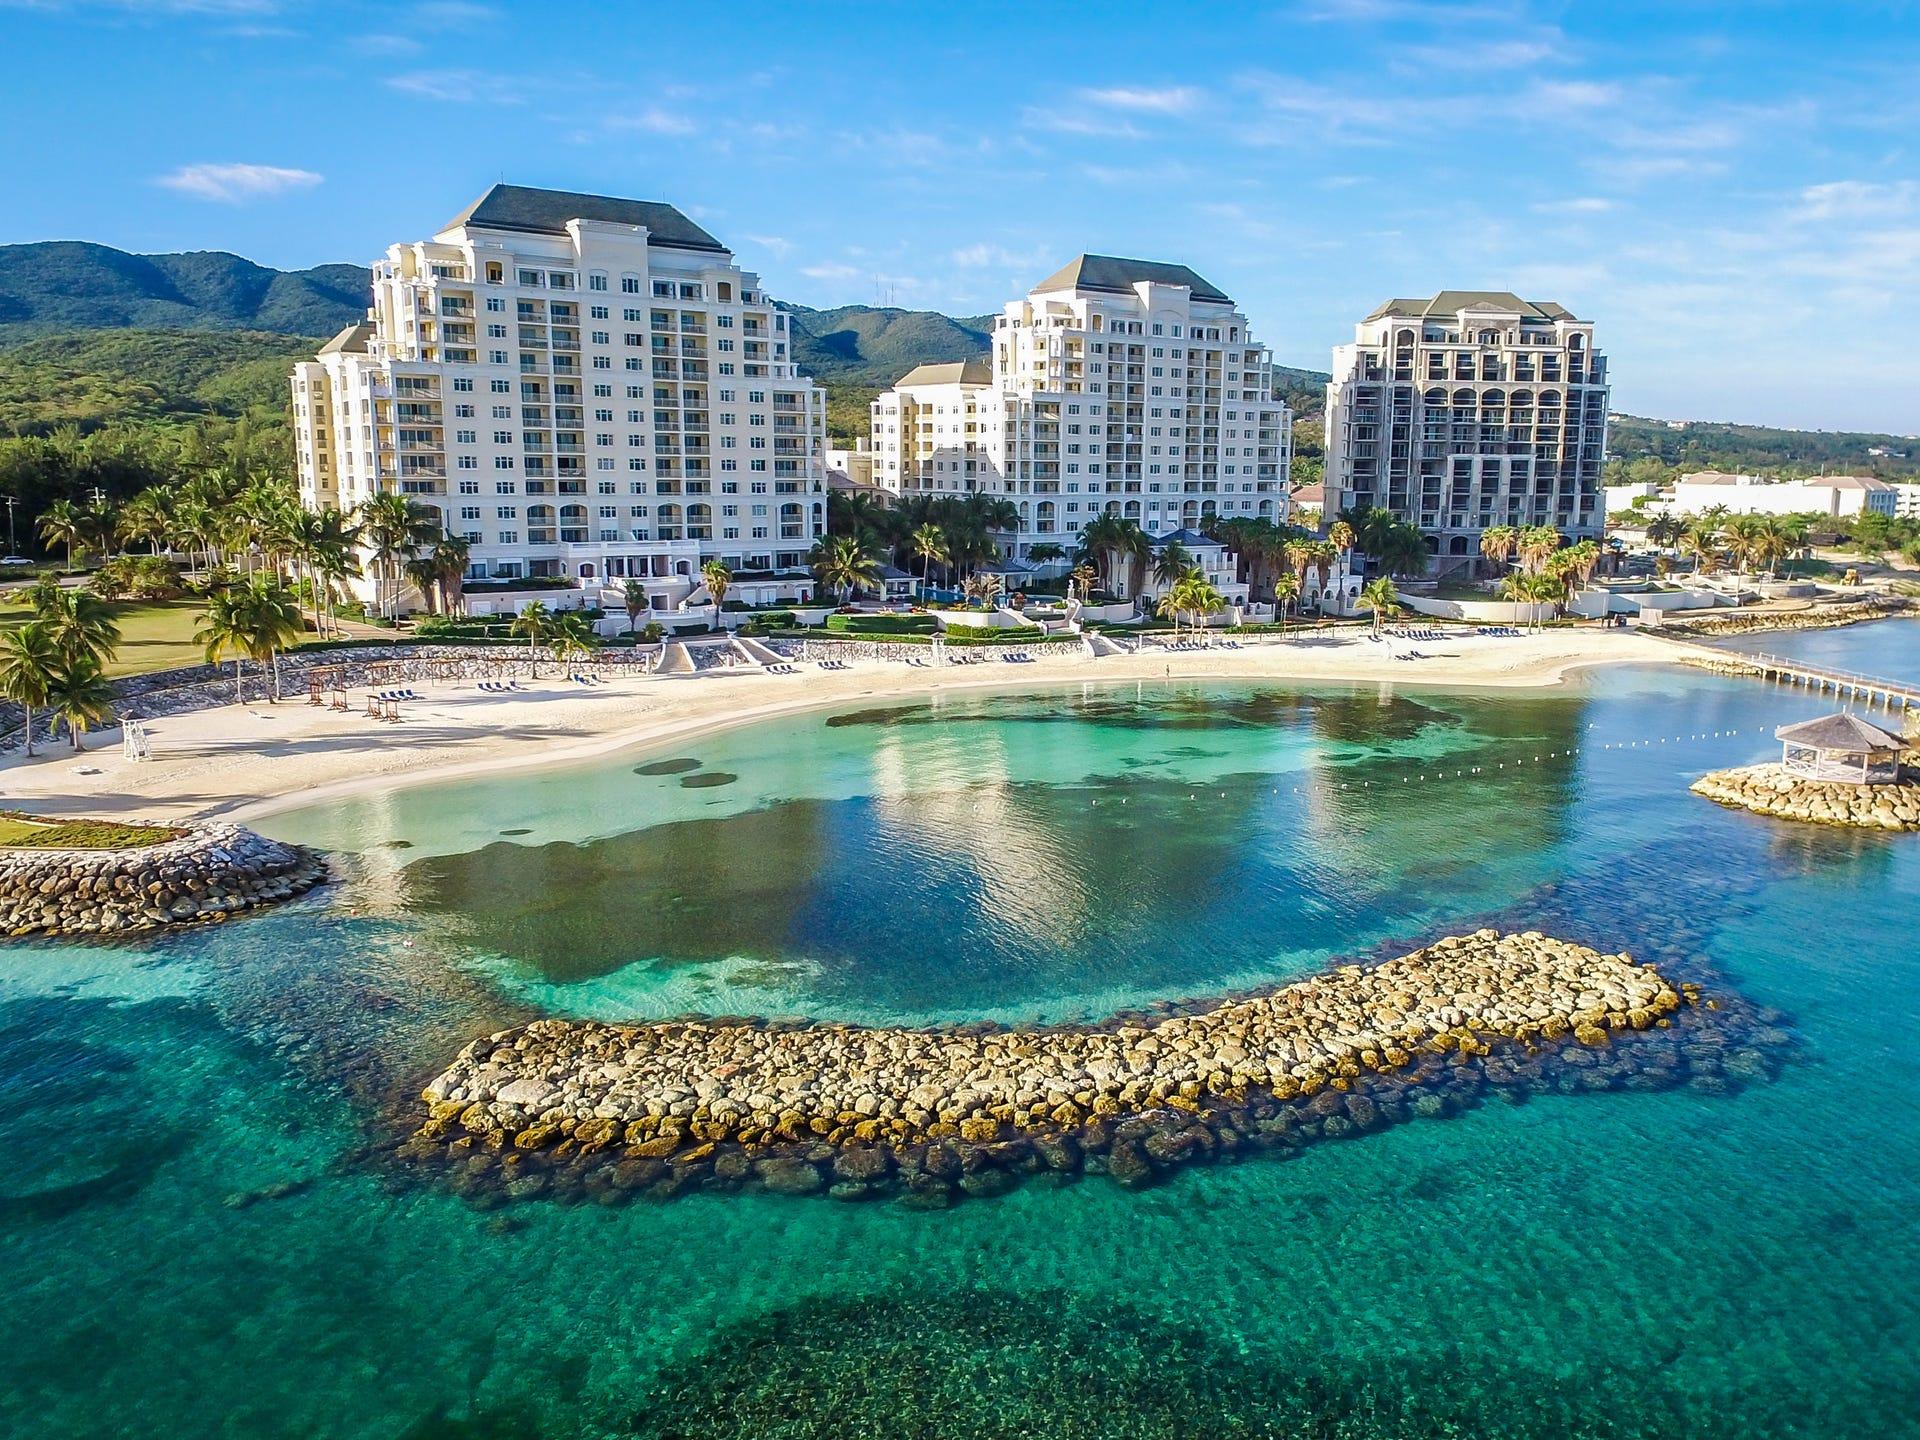 Caribbean All Inclusive Resorts Maximum Fun For The Money